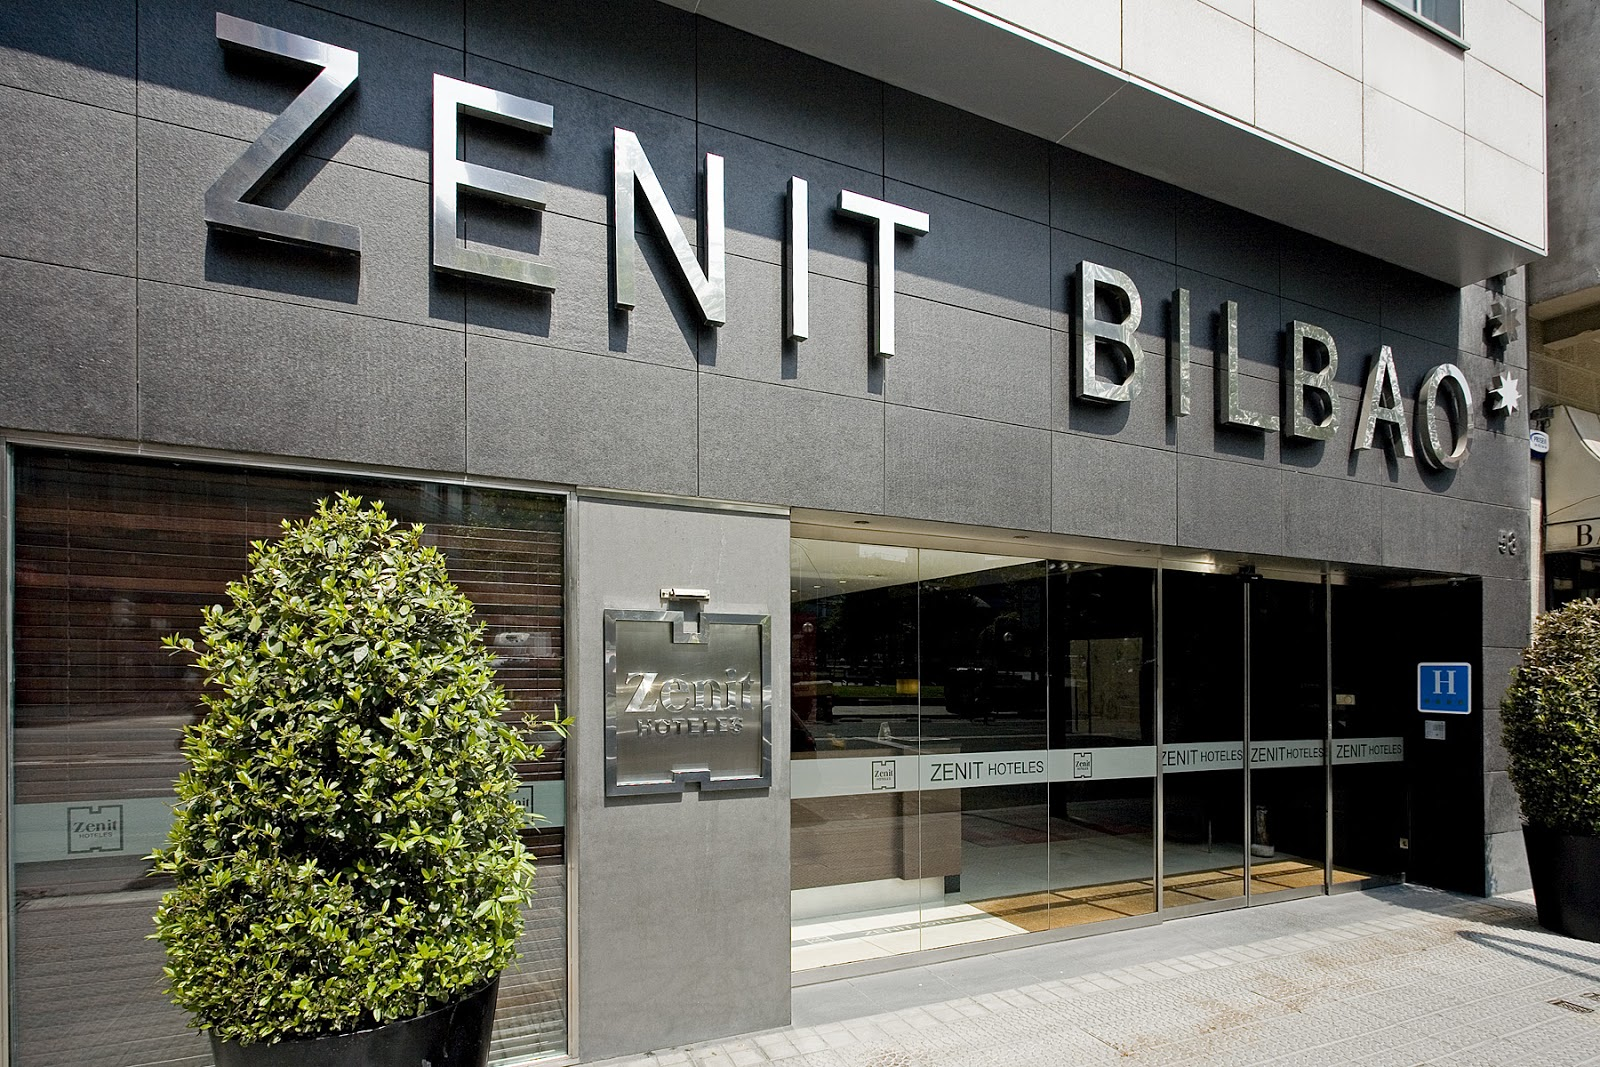 Restaurante Abando  Hotel Zenit Bilbao